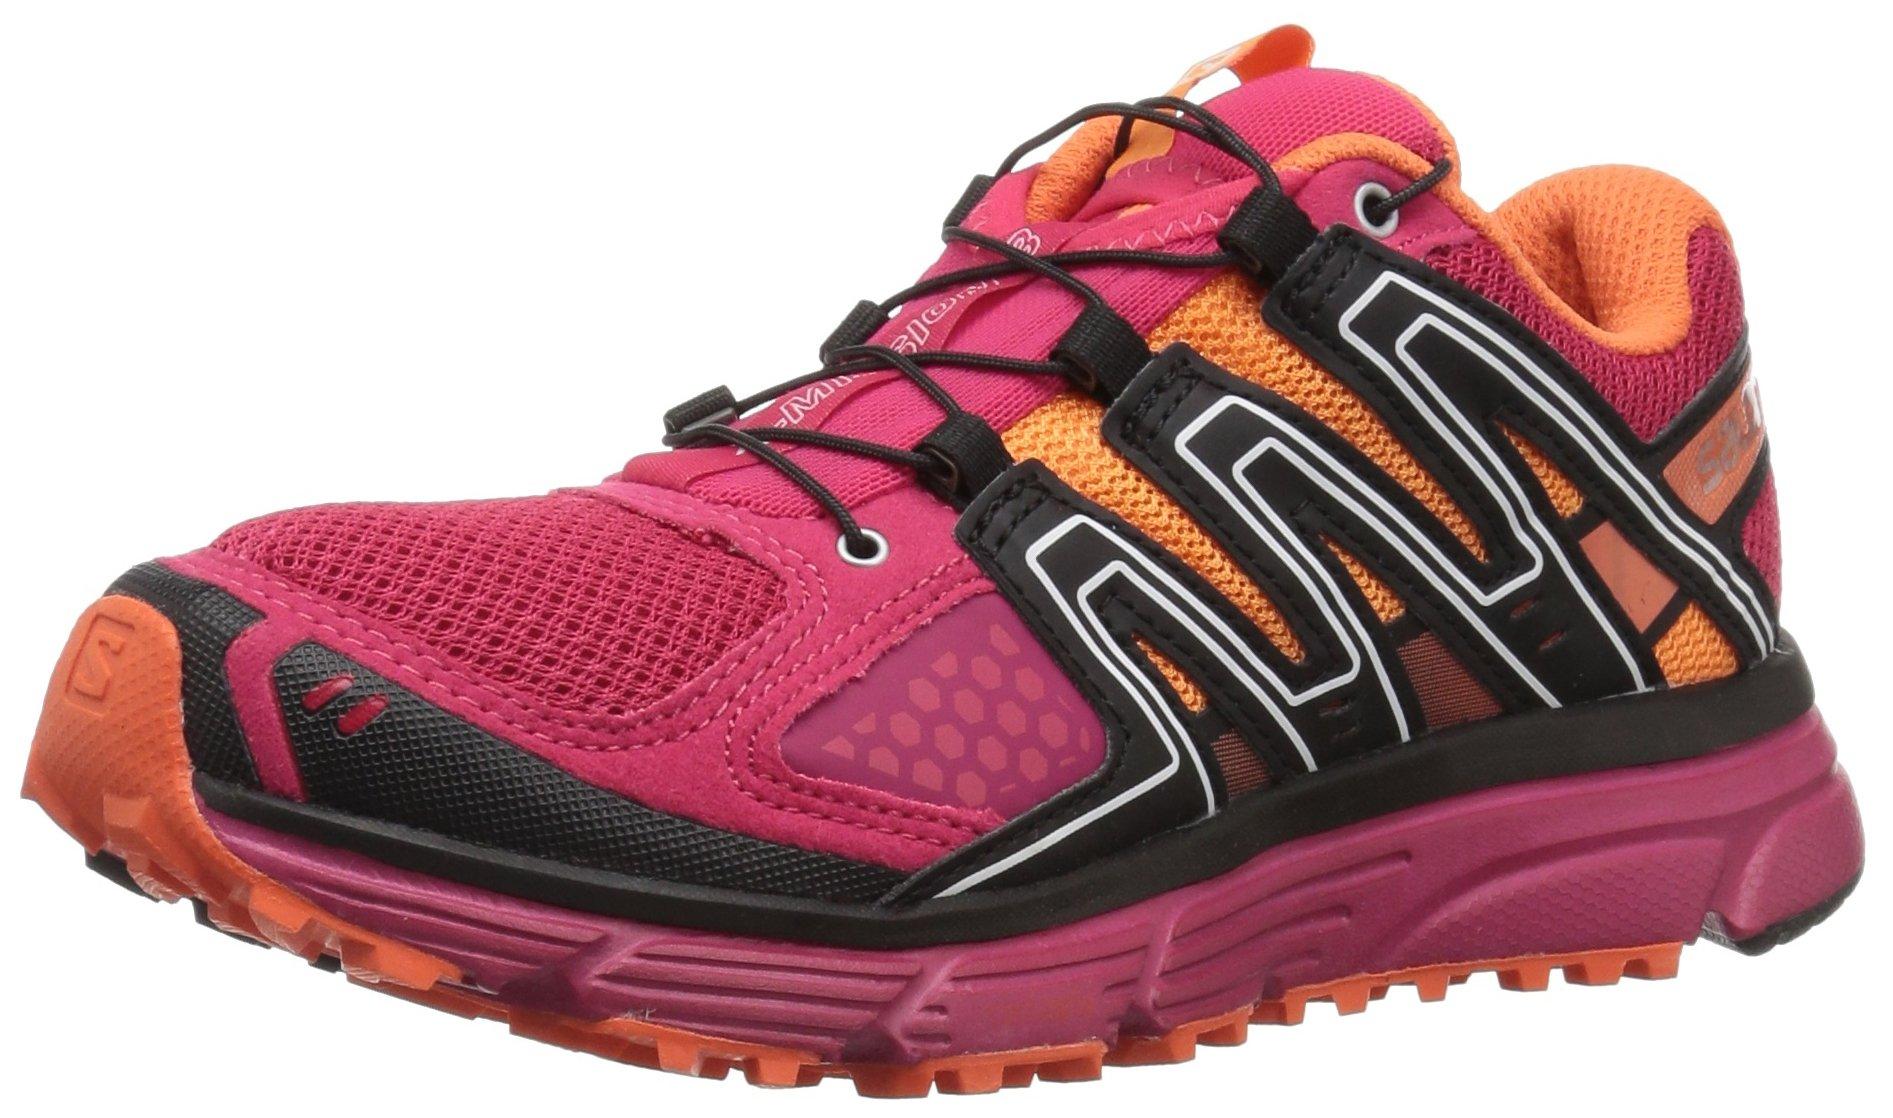 SALOMON Women's X-Mission 3 W Trail Running Shoe, Virtual Pink, 7.5 M US by SALOMON